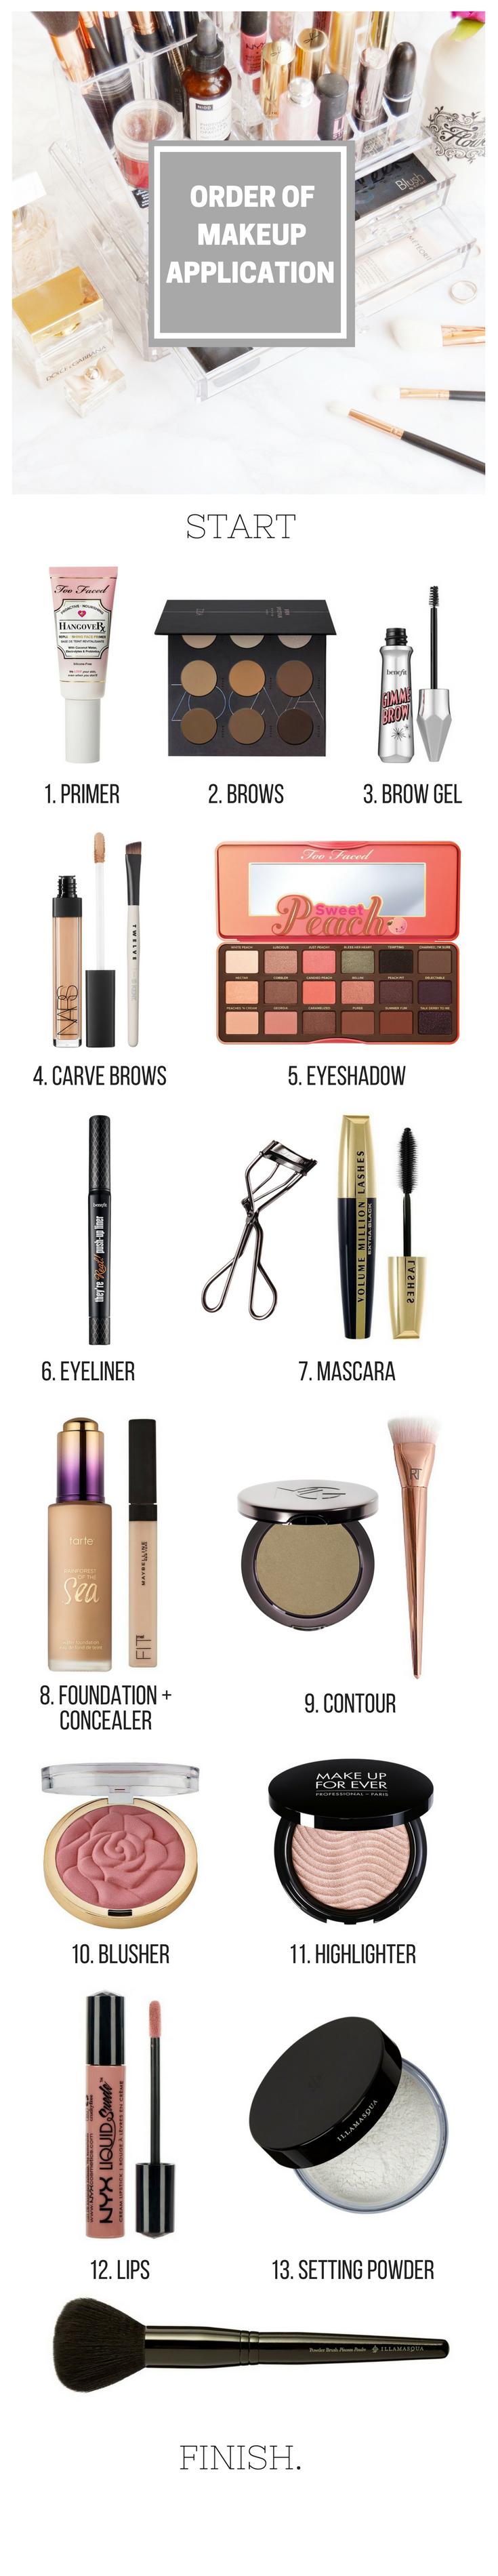 makeup-application-order